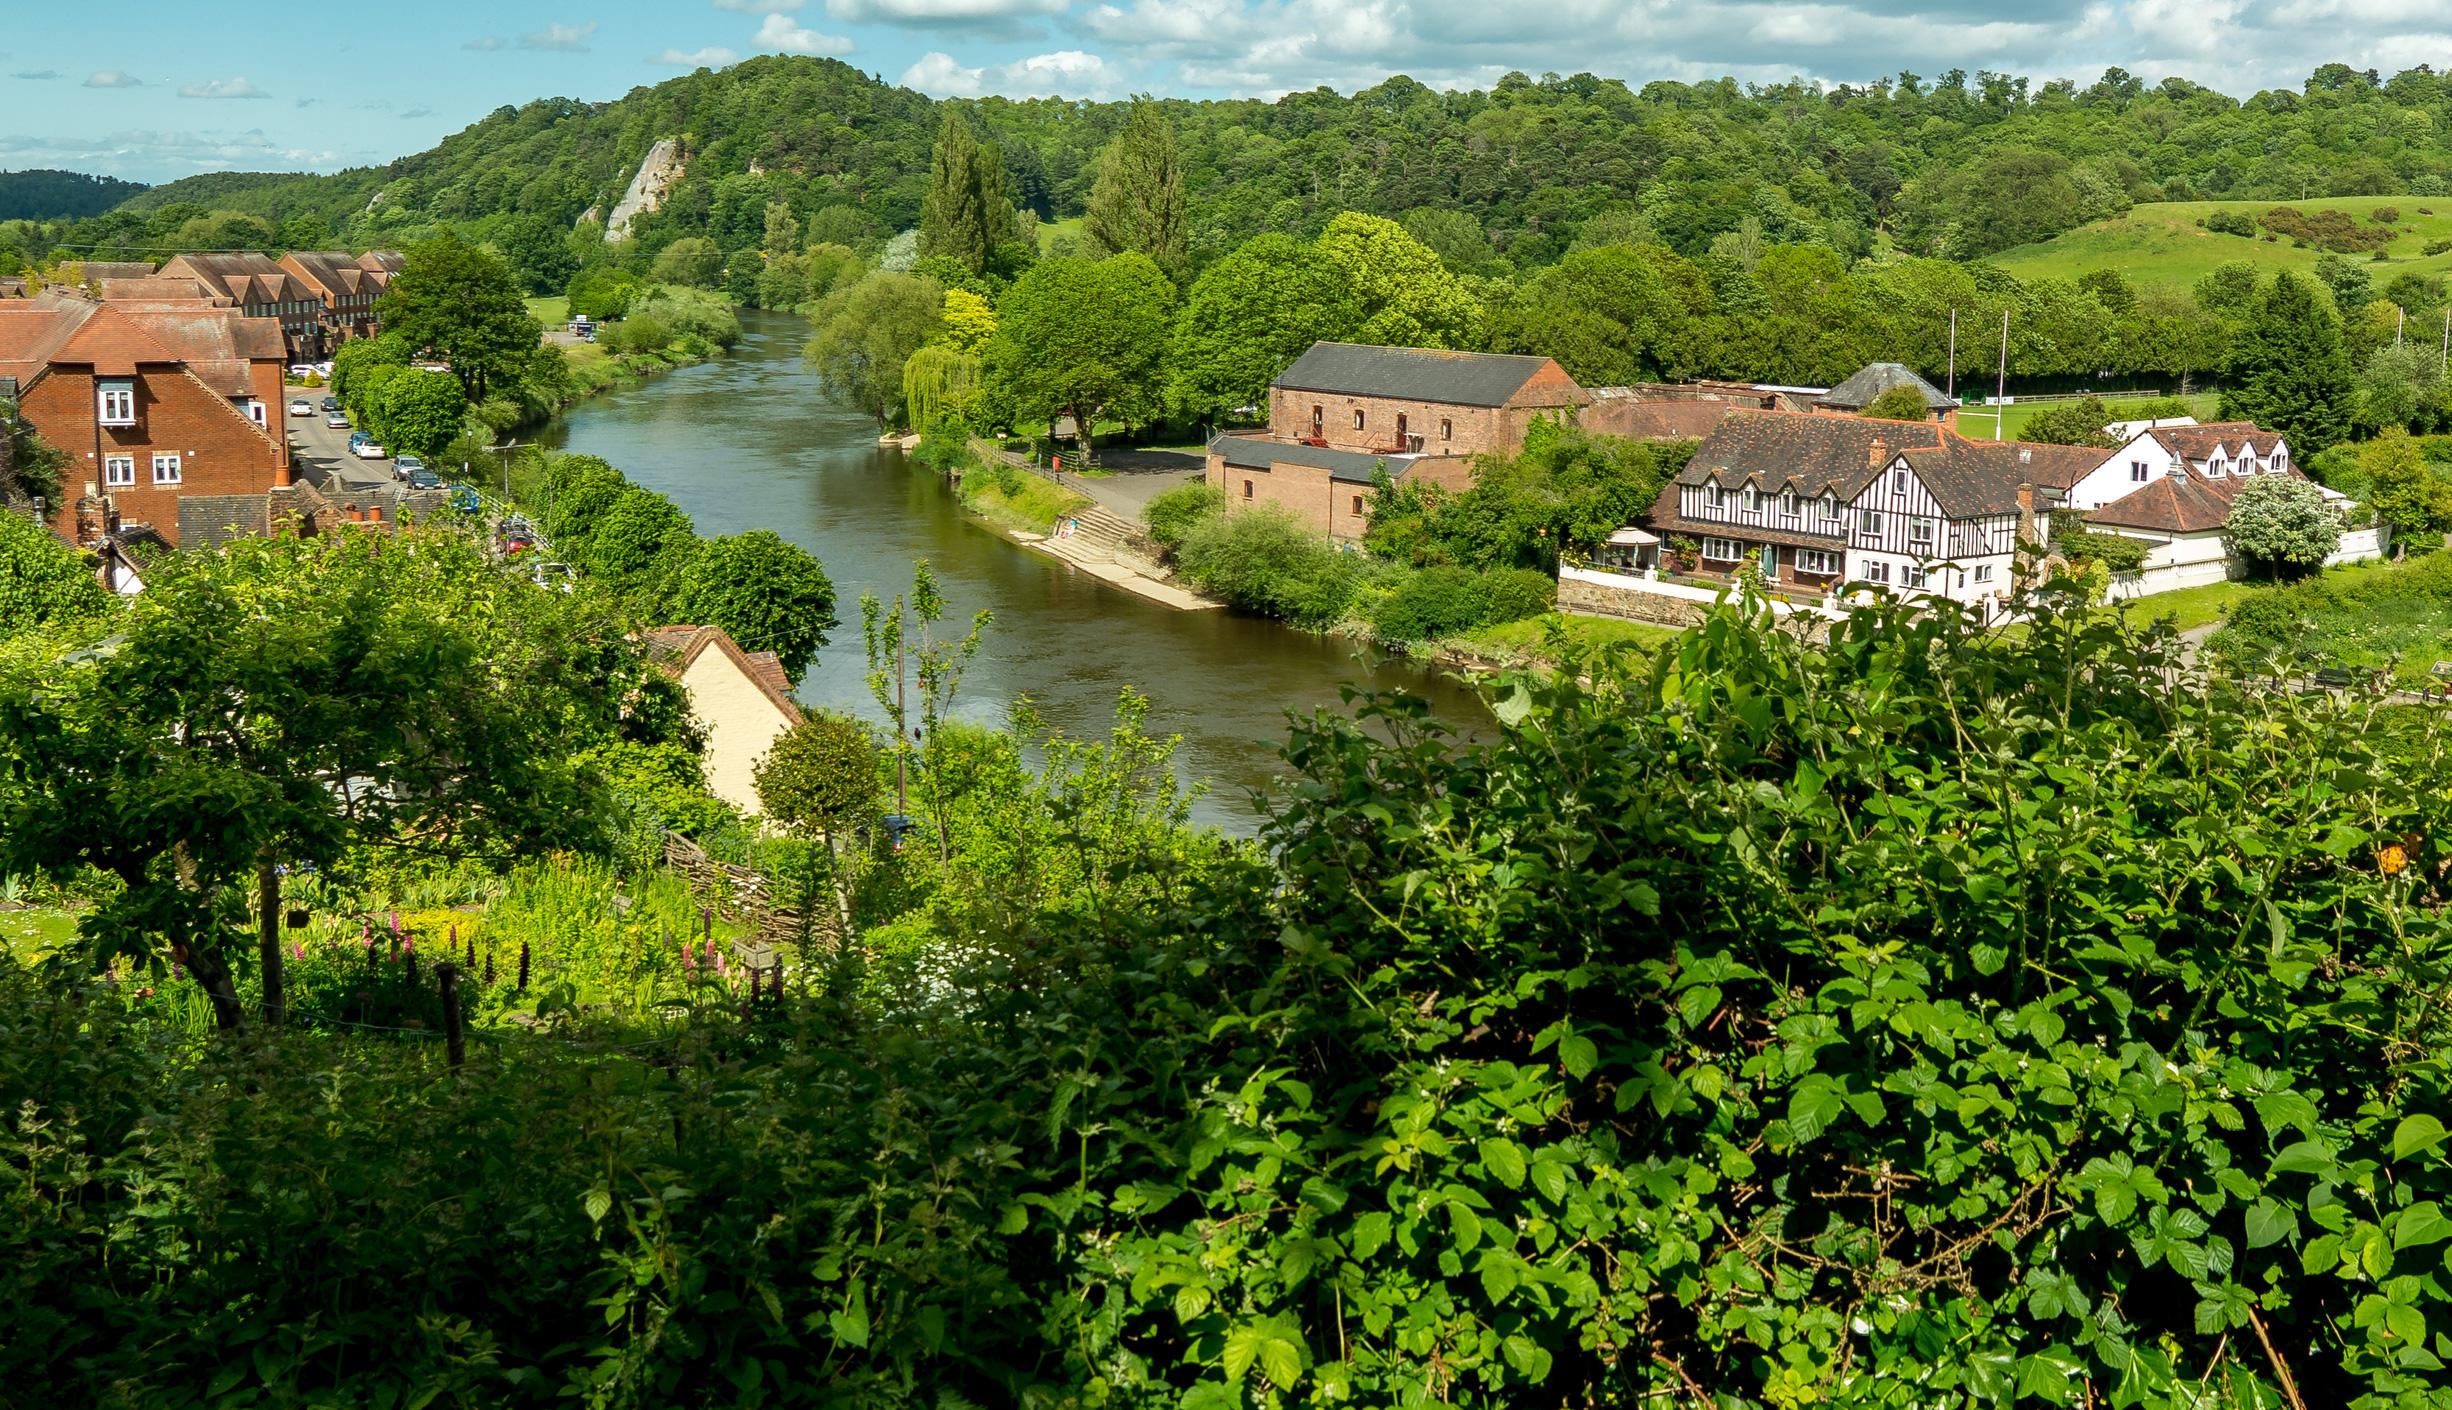 Bridgnorth on the Severn Way